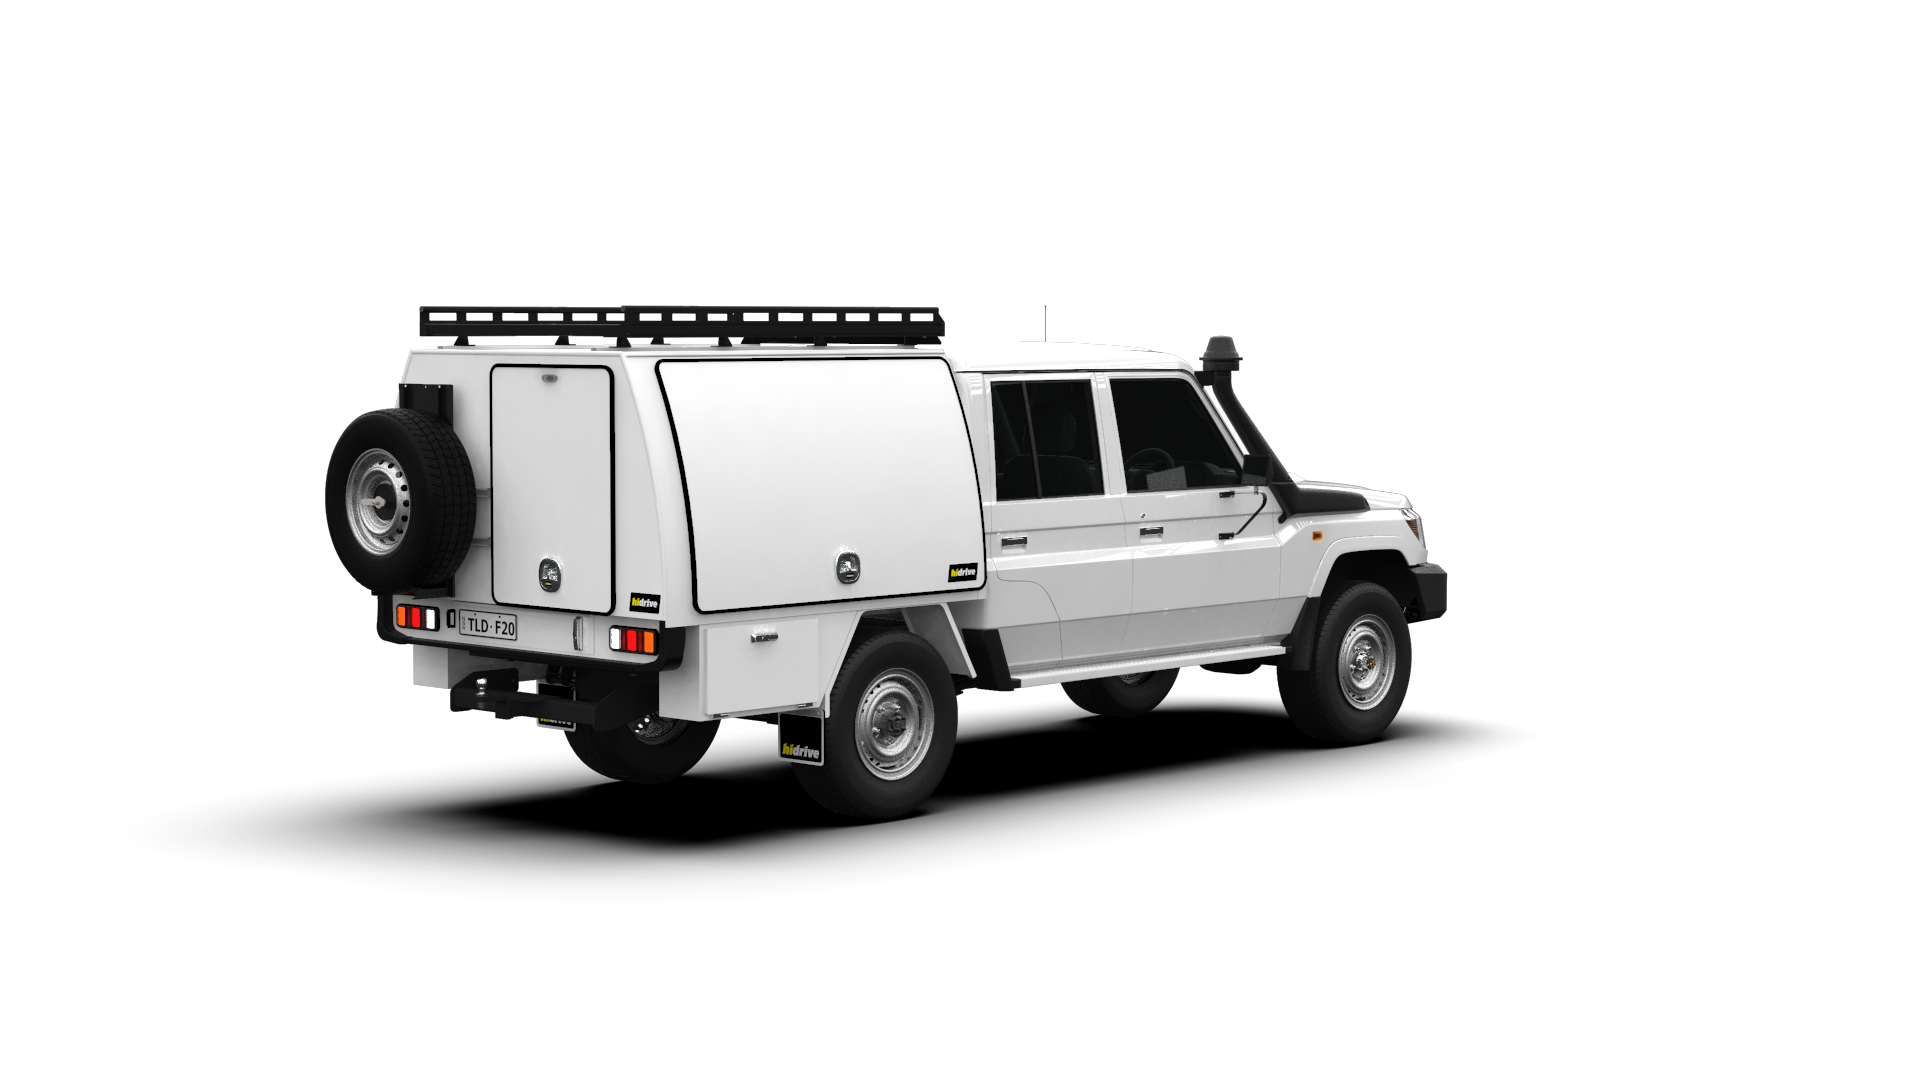 Toyota Landcruiser Double Cab Full Canopy